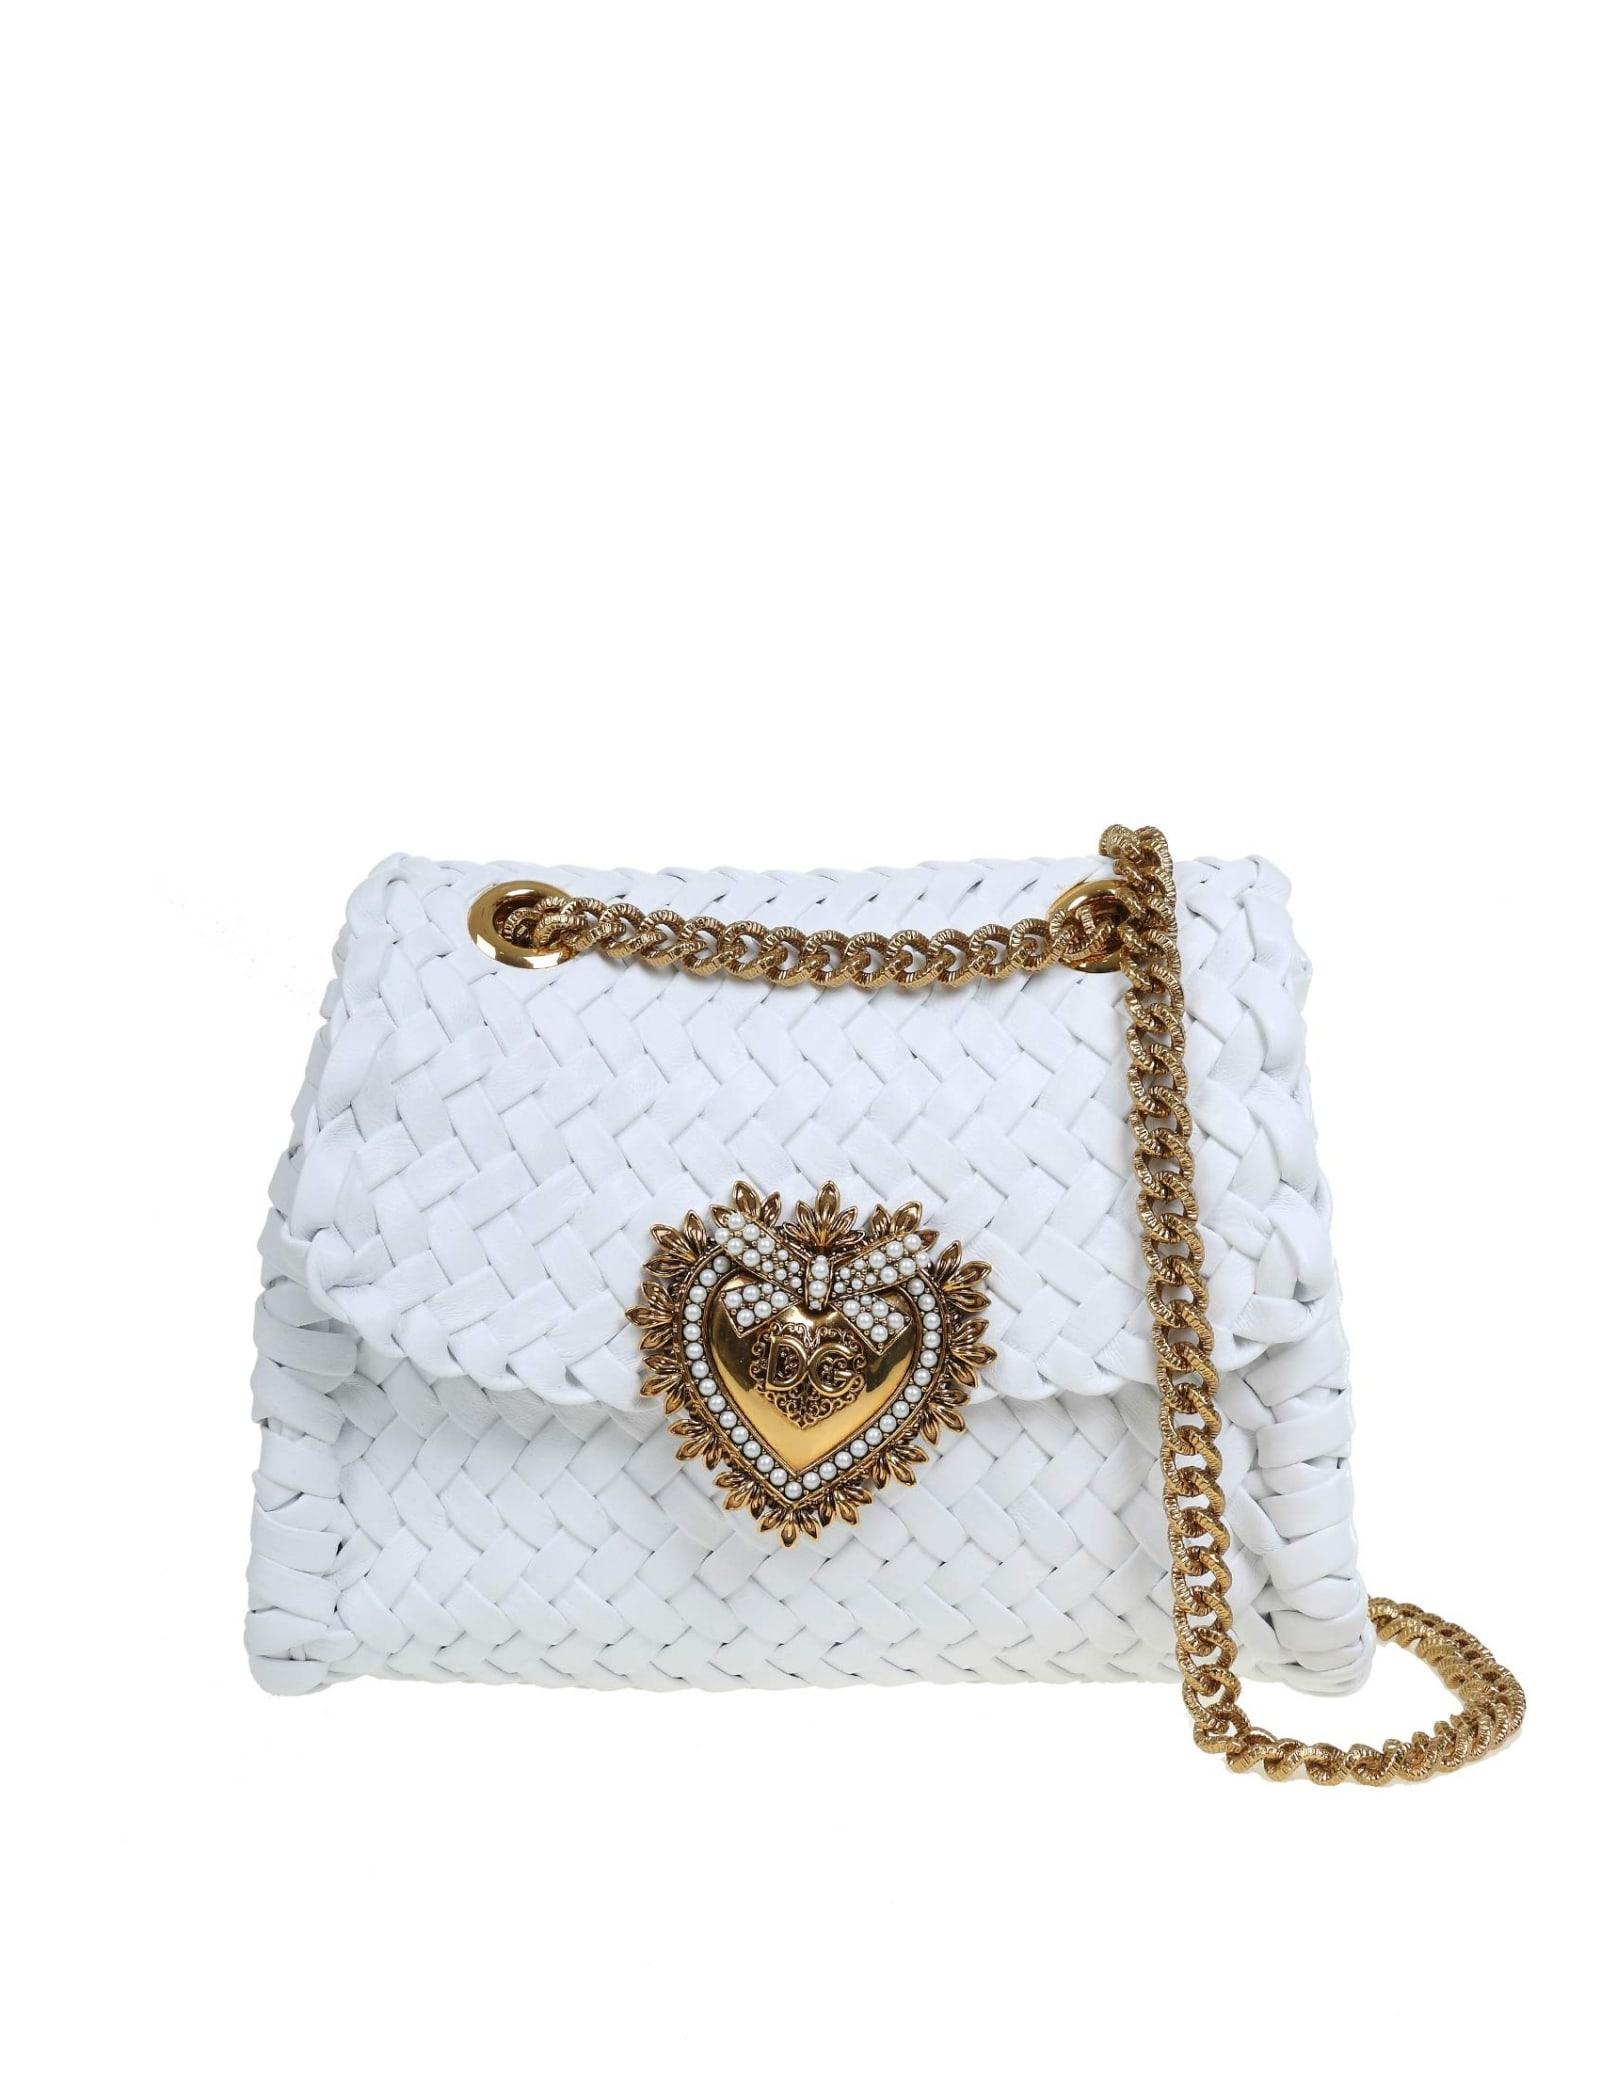 Dolce & Gabbana Small Devotion Shoulder Bag In Woven Nappa In White